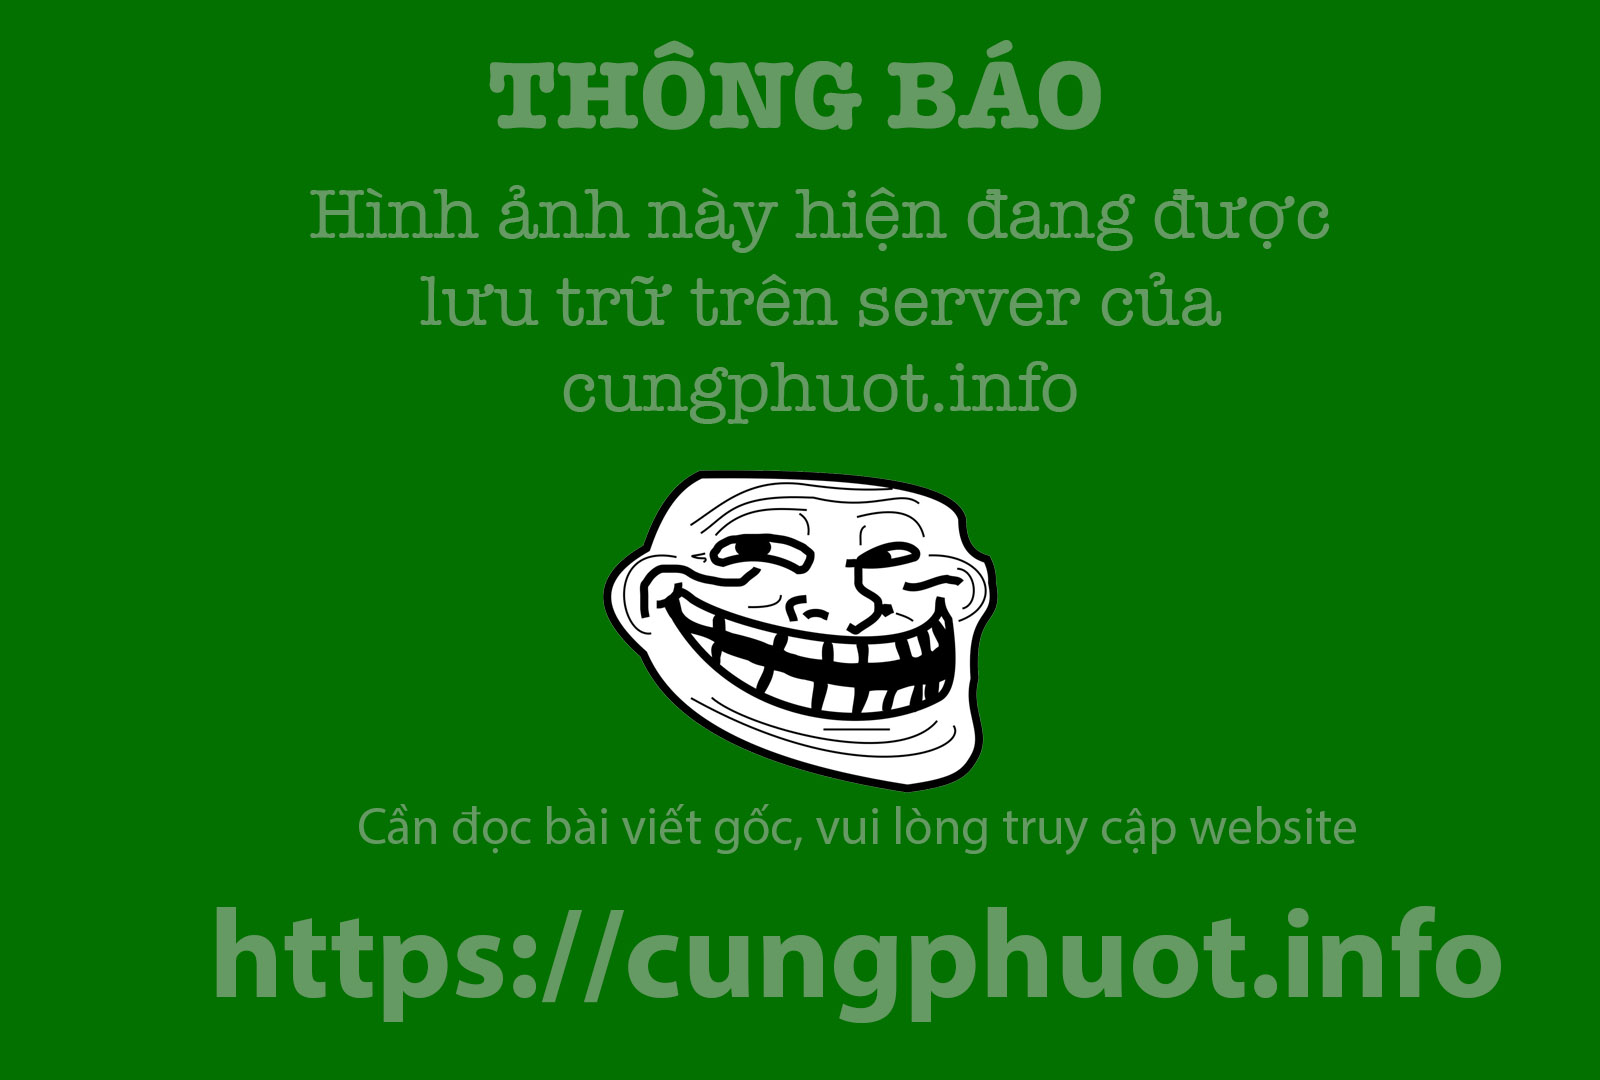 Den Moc Chau san mai anh dao hinh anh 7